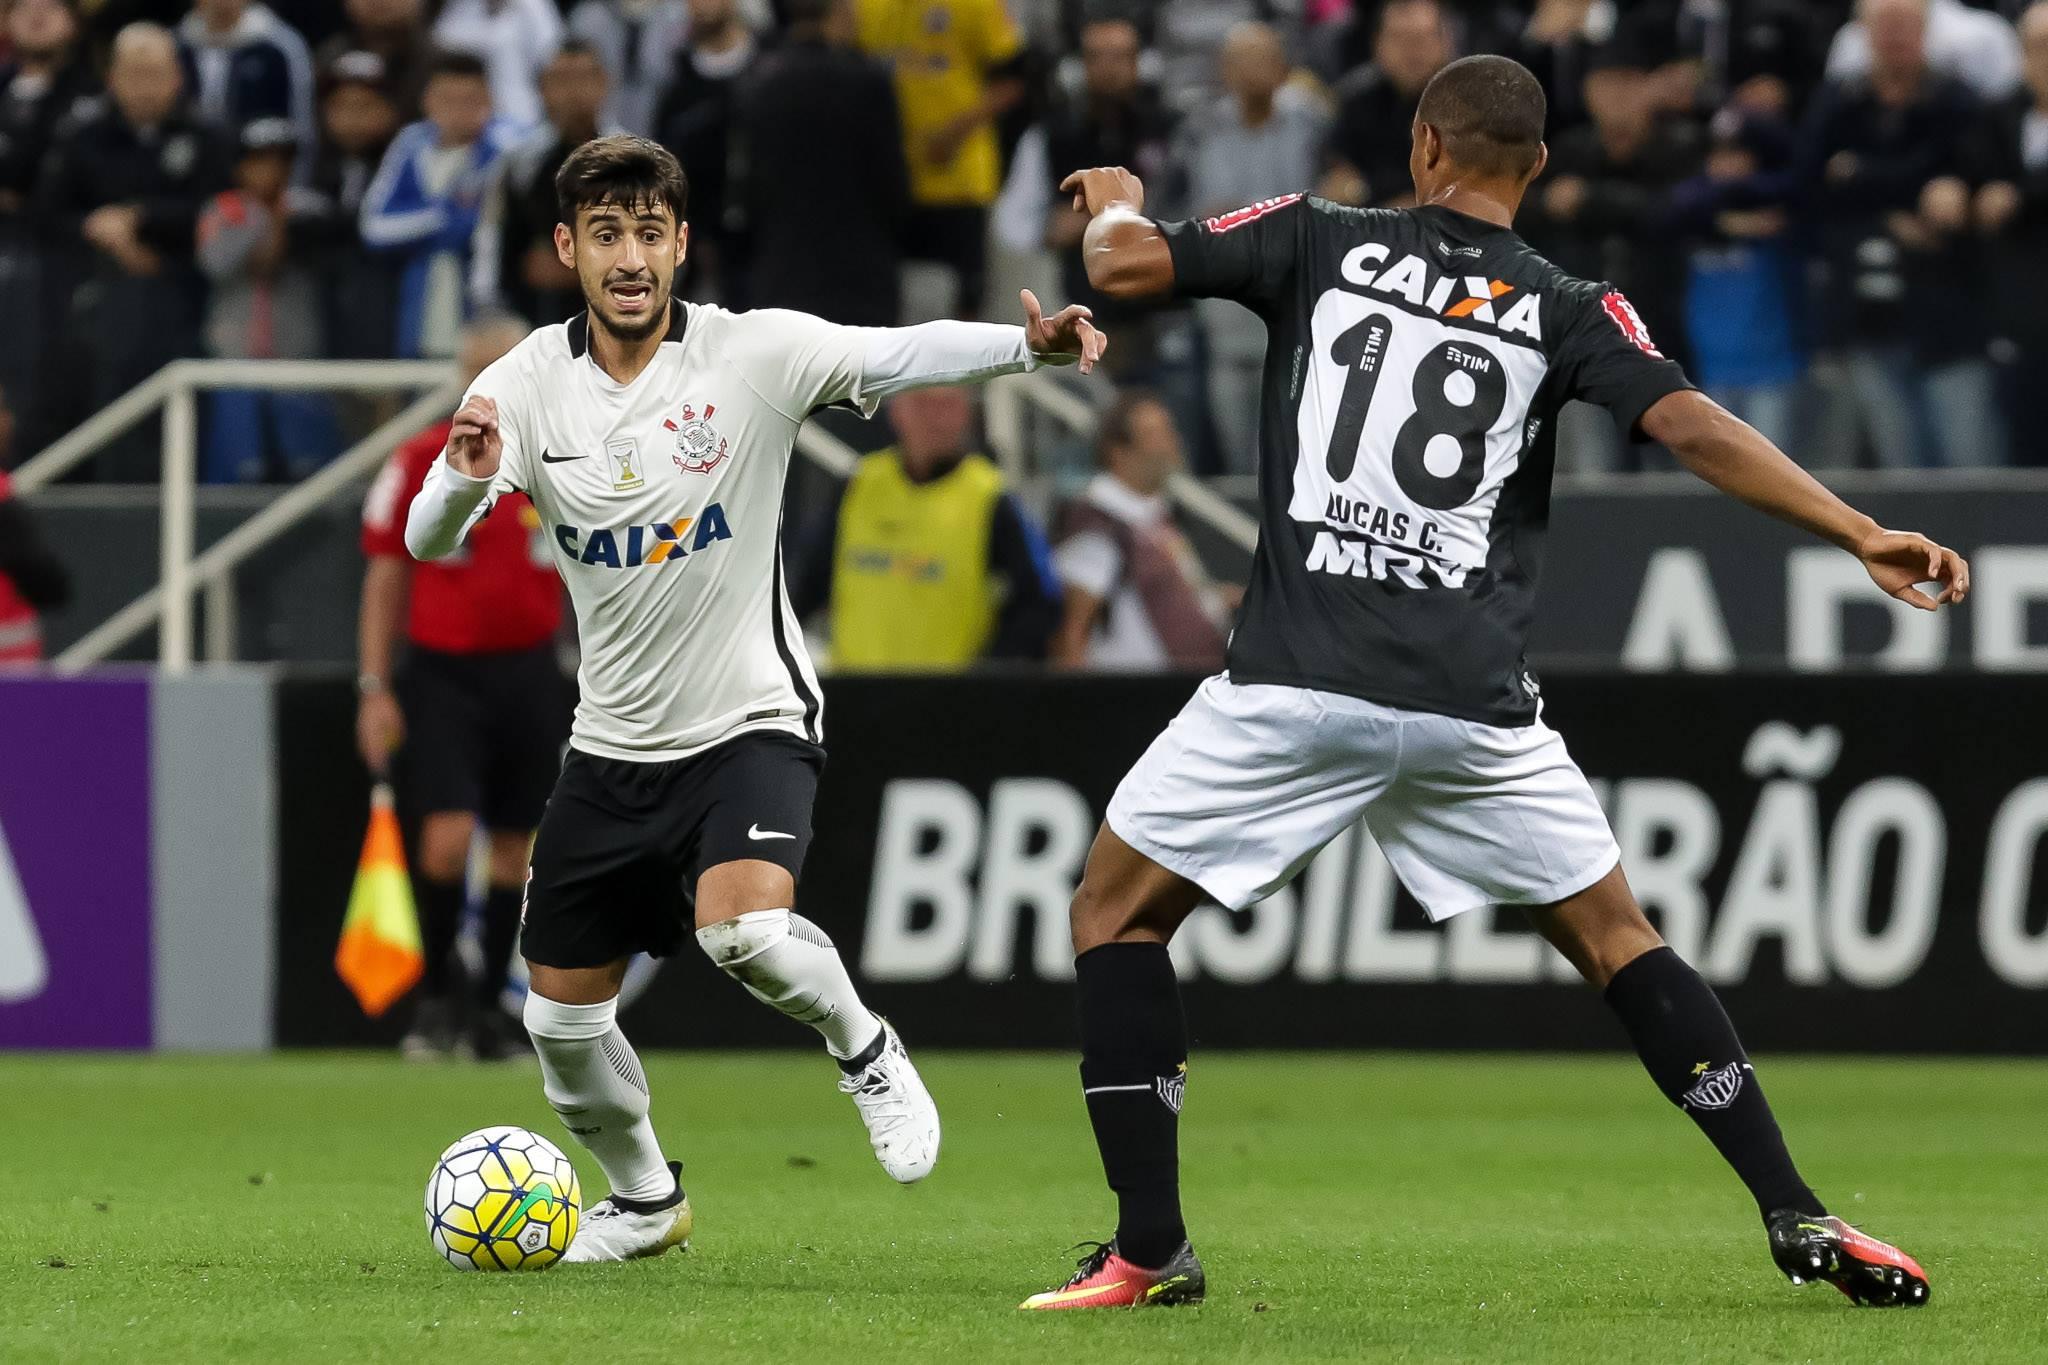 Corinthians 0 x 0 Atlético-MG